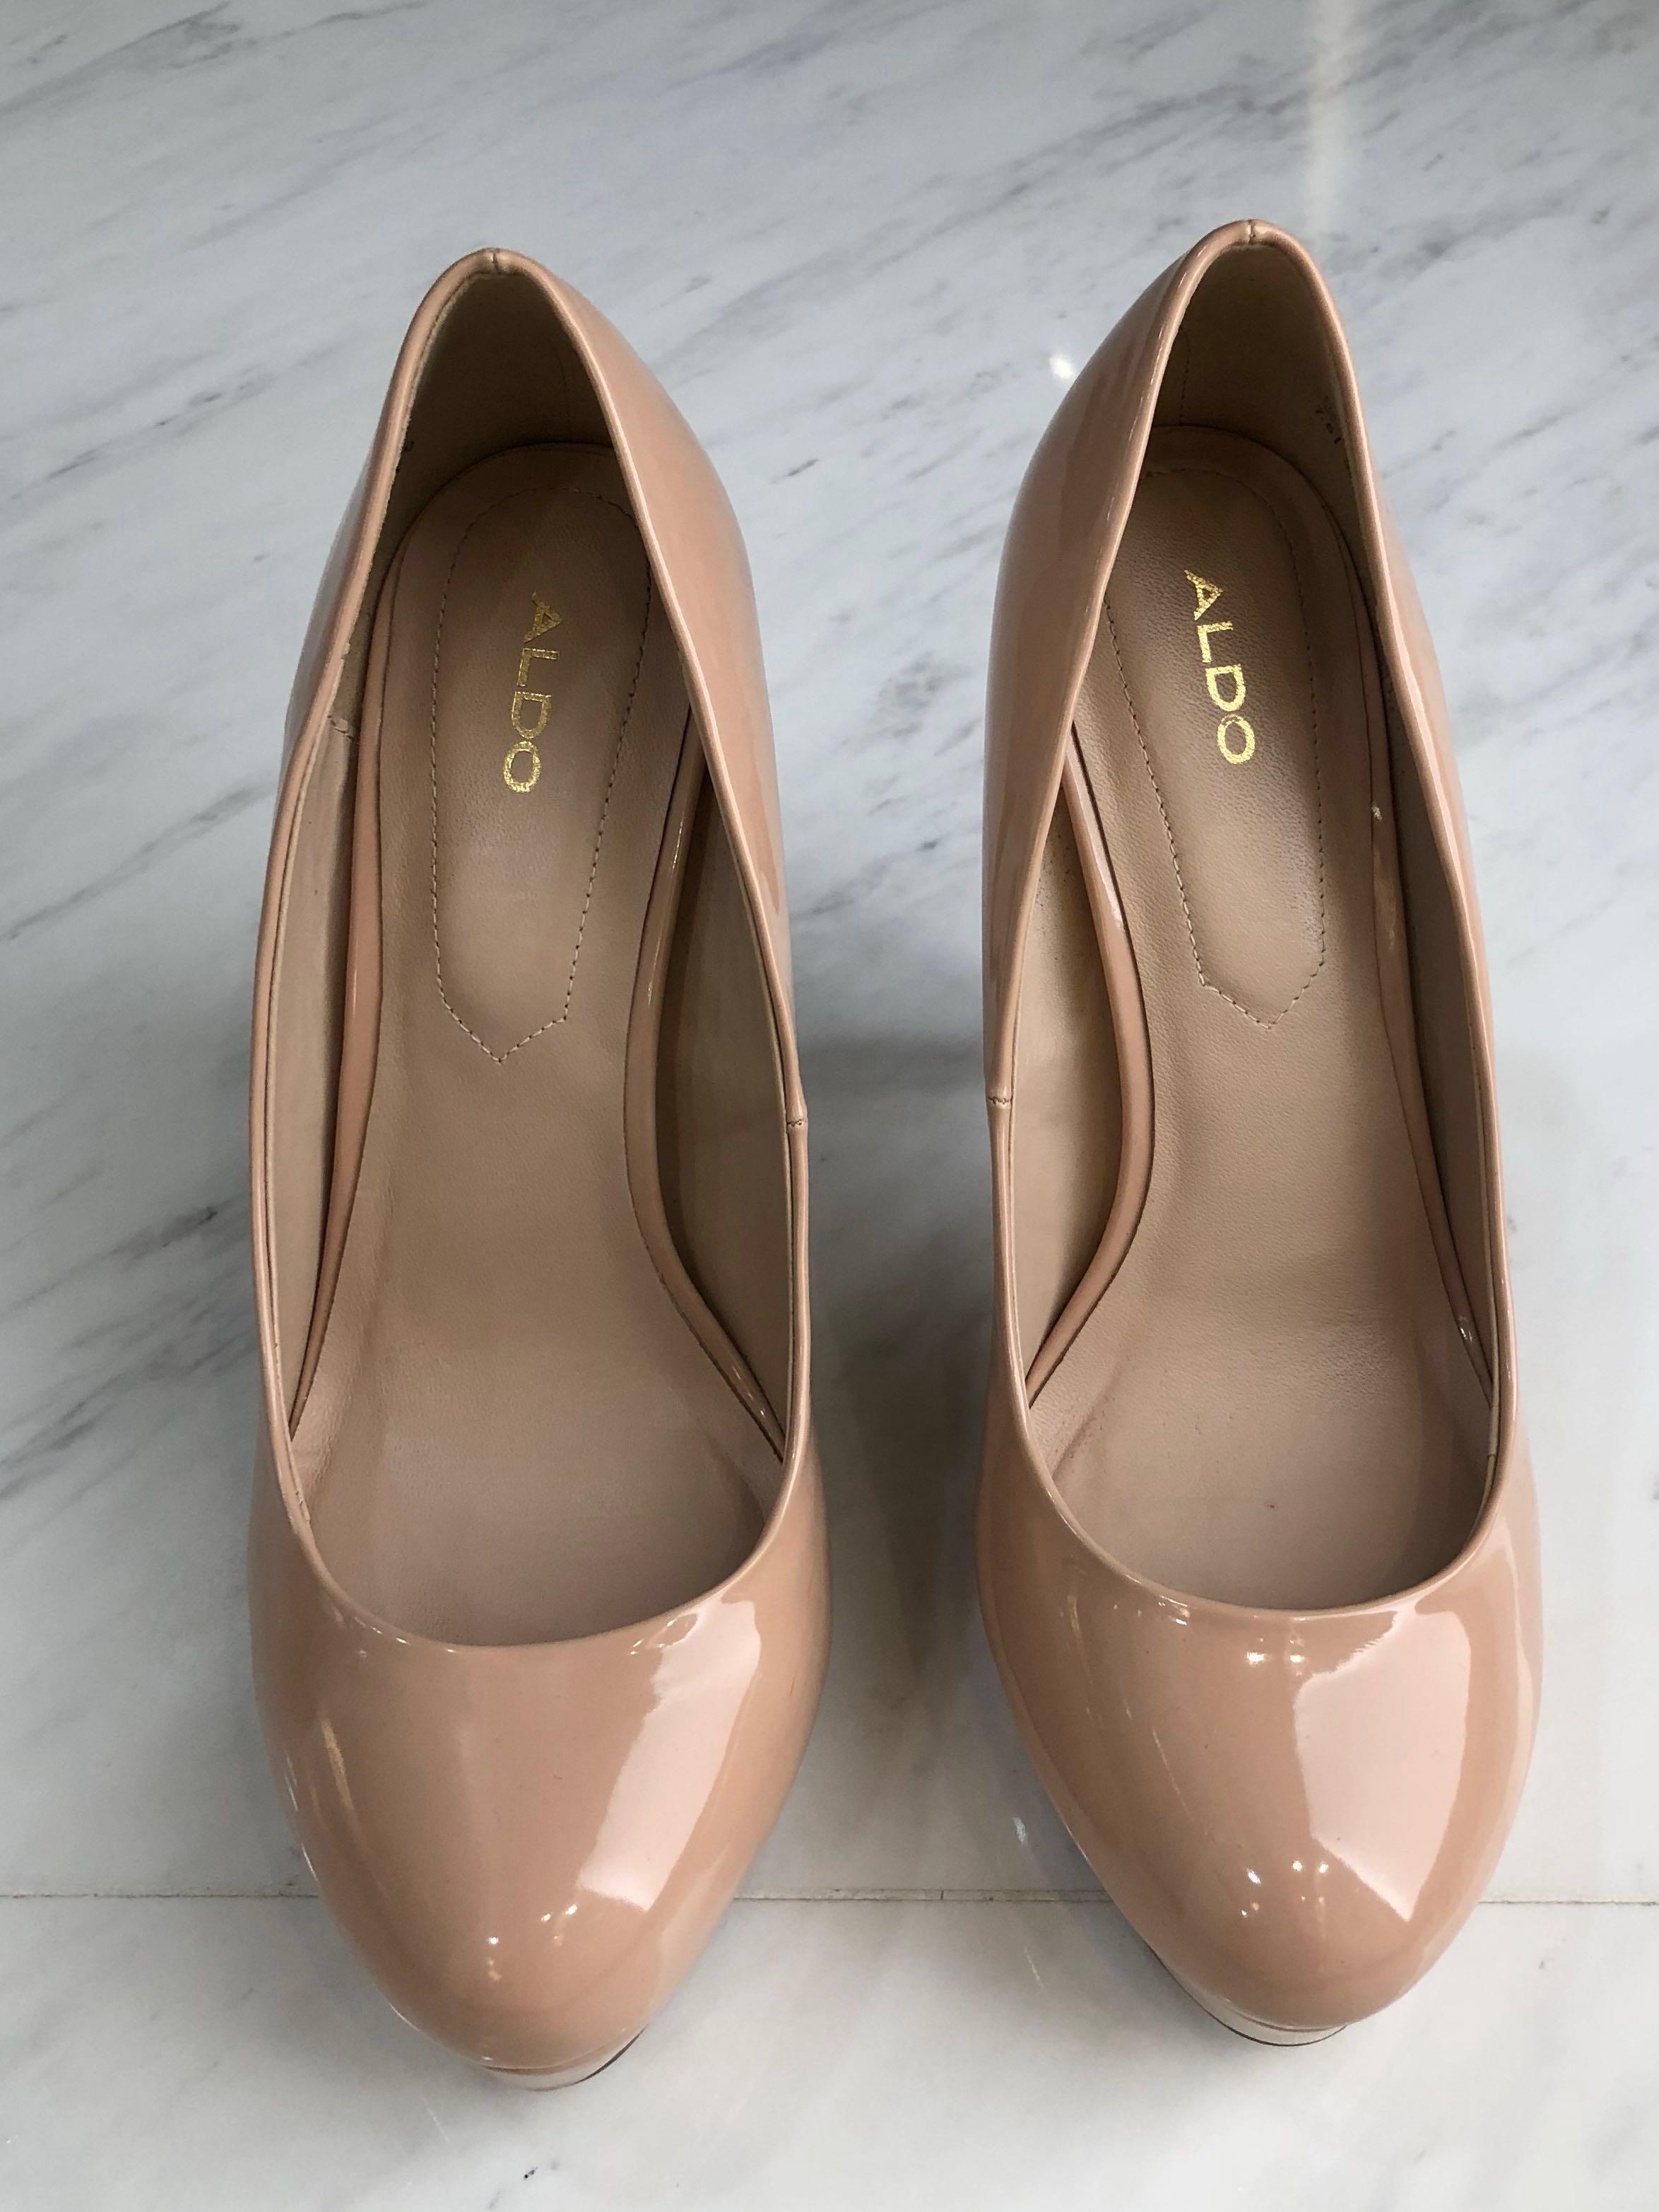 Aldo Nude Colour Heels, Women's Fashion